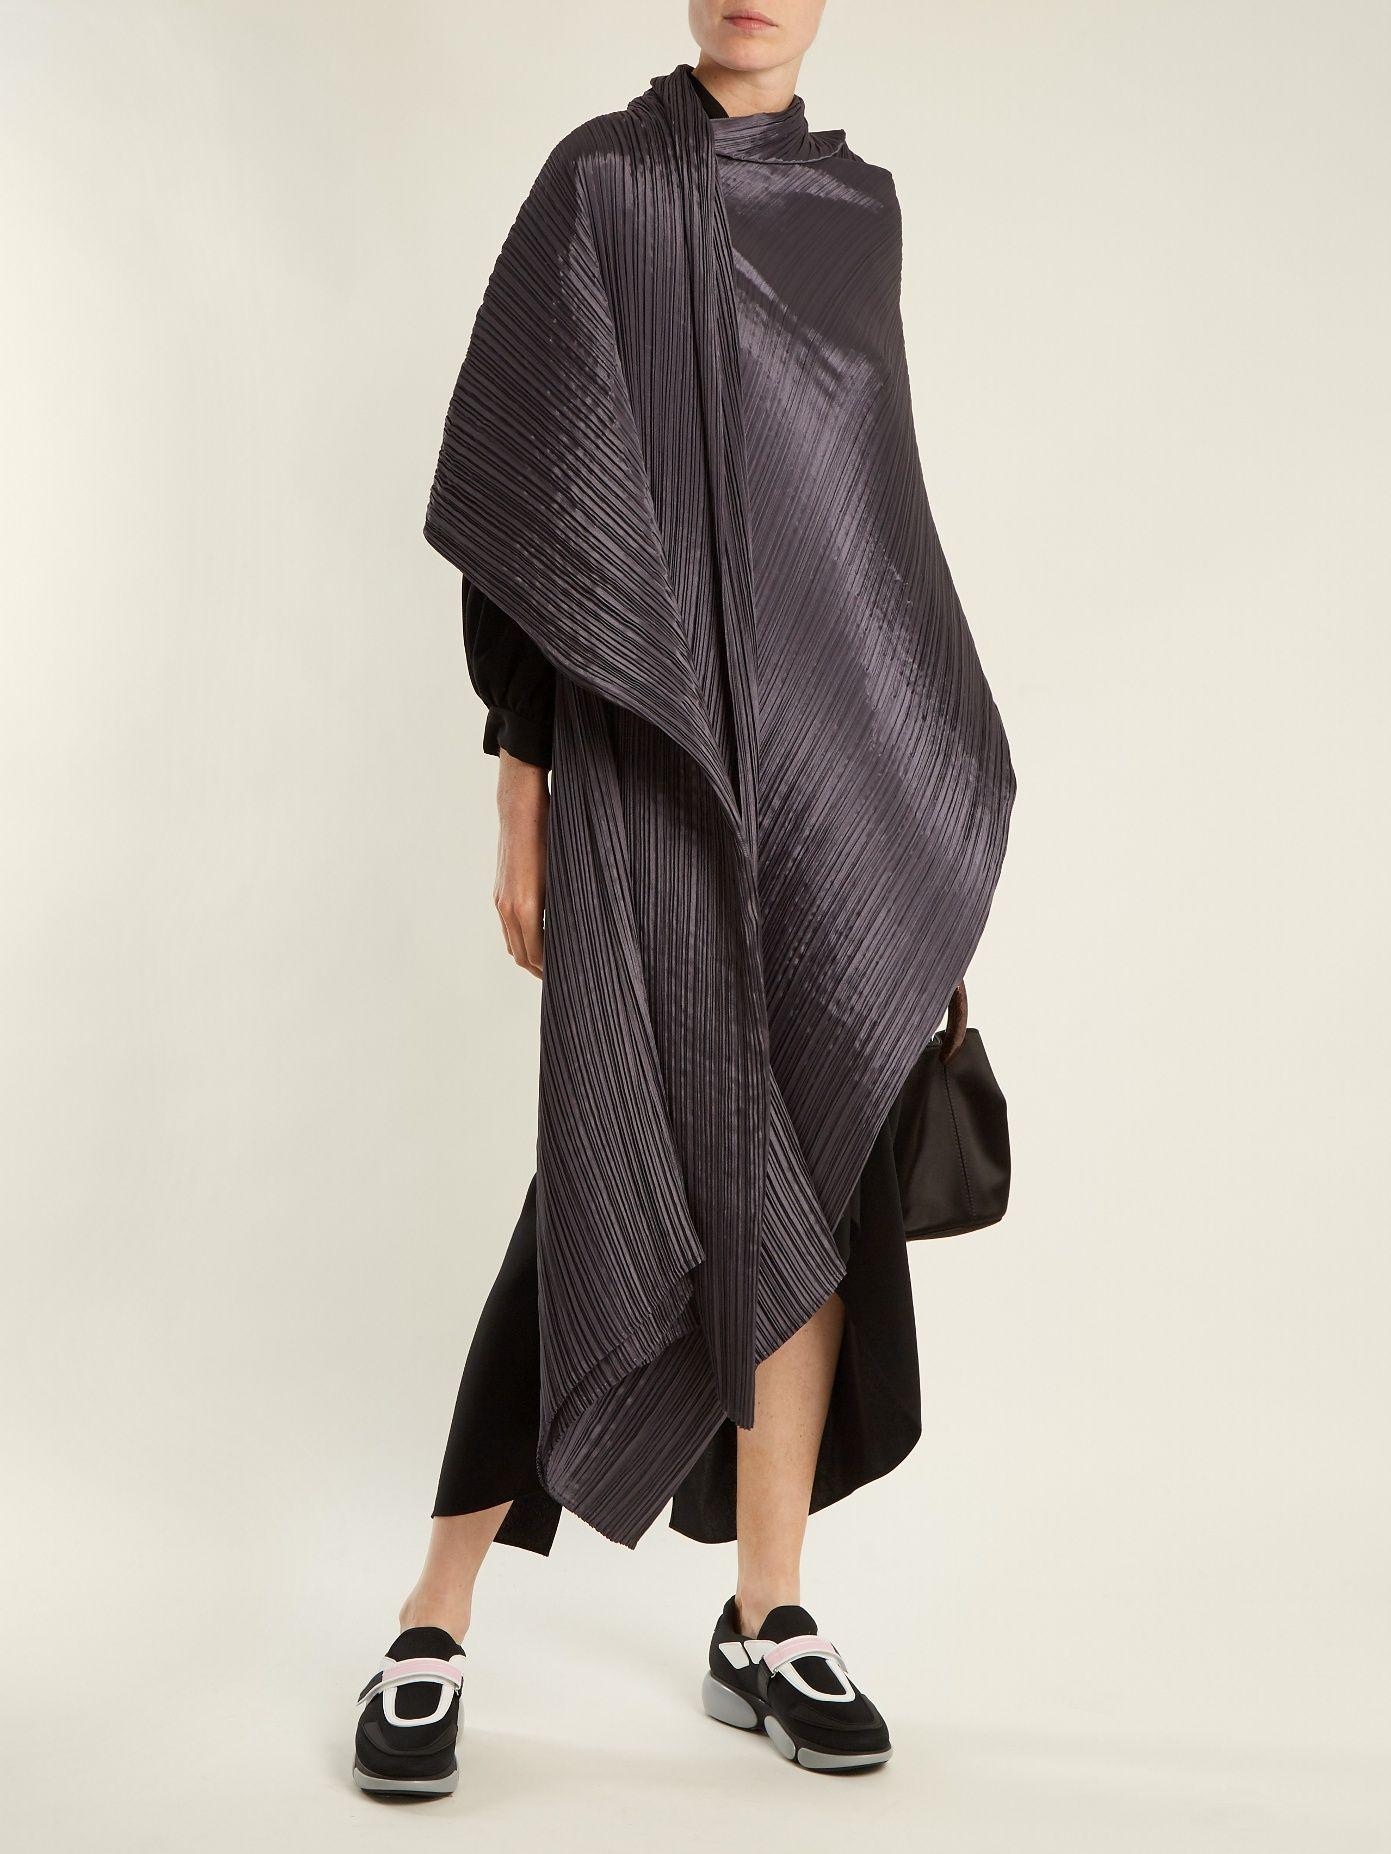 Madame T pleated scarf Pleats Please Issey Miyake obZ7y6brKq